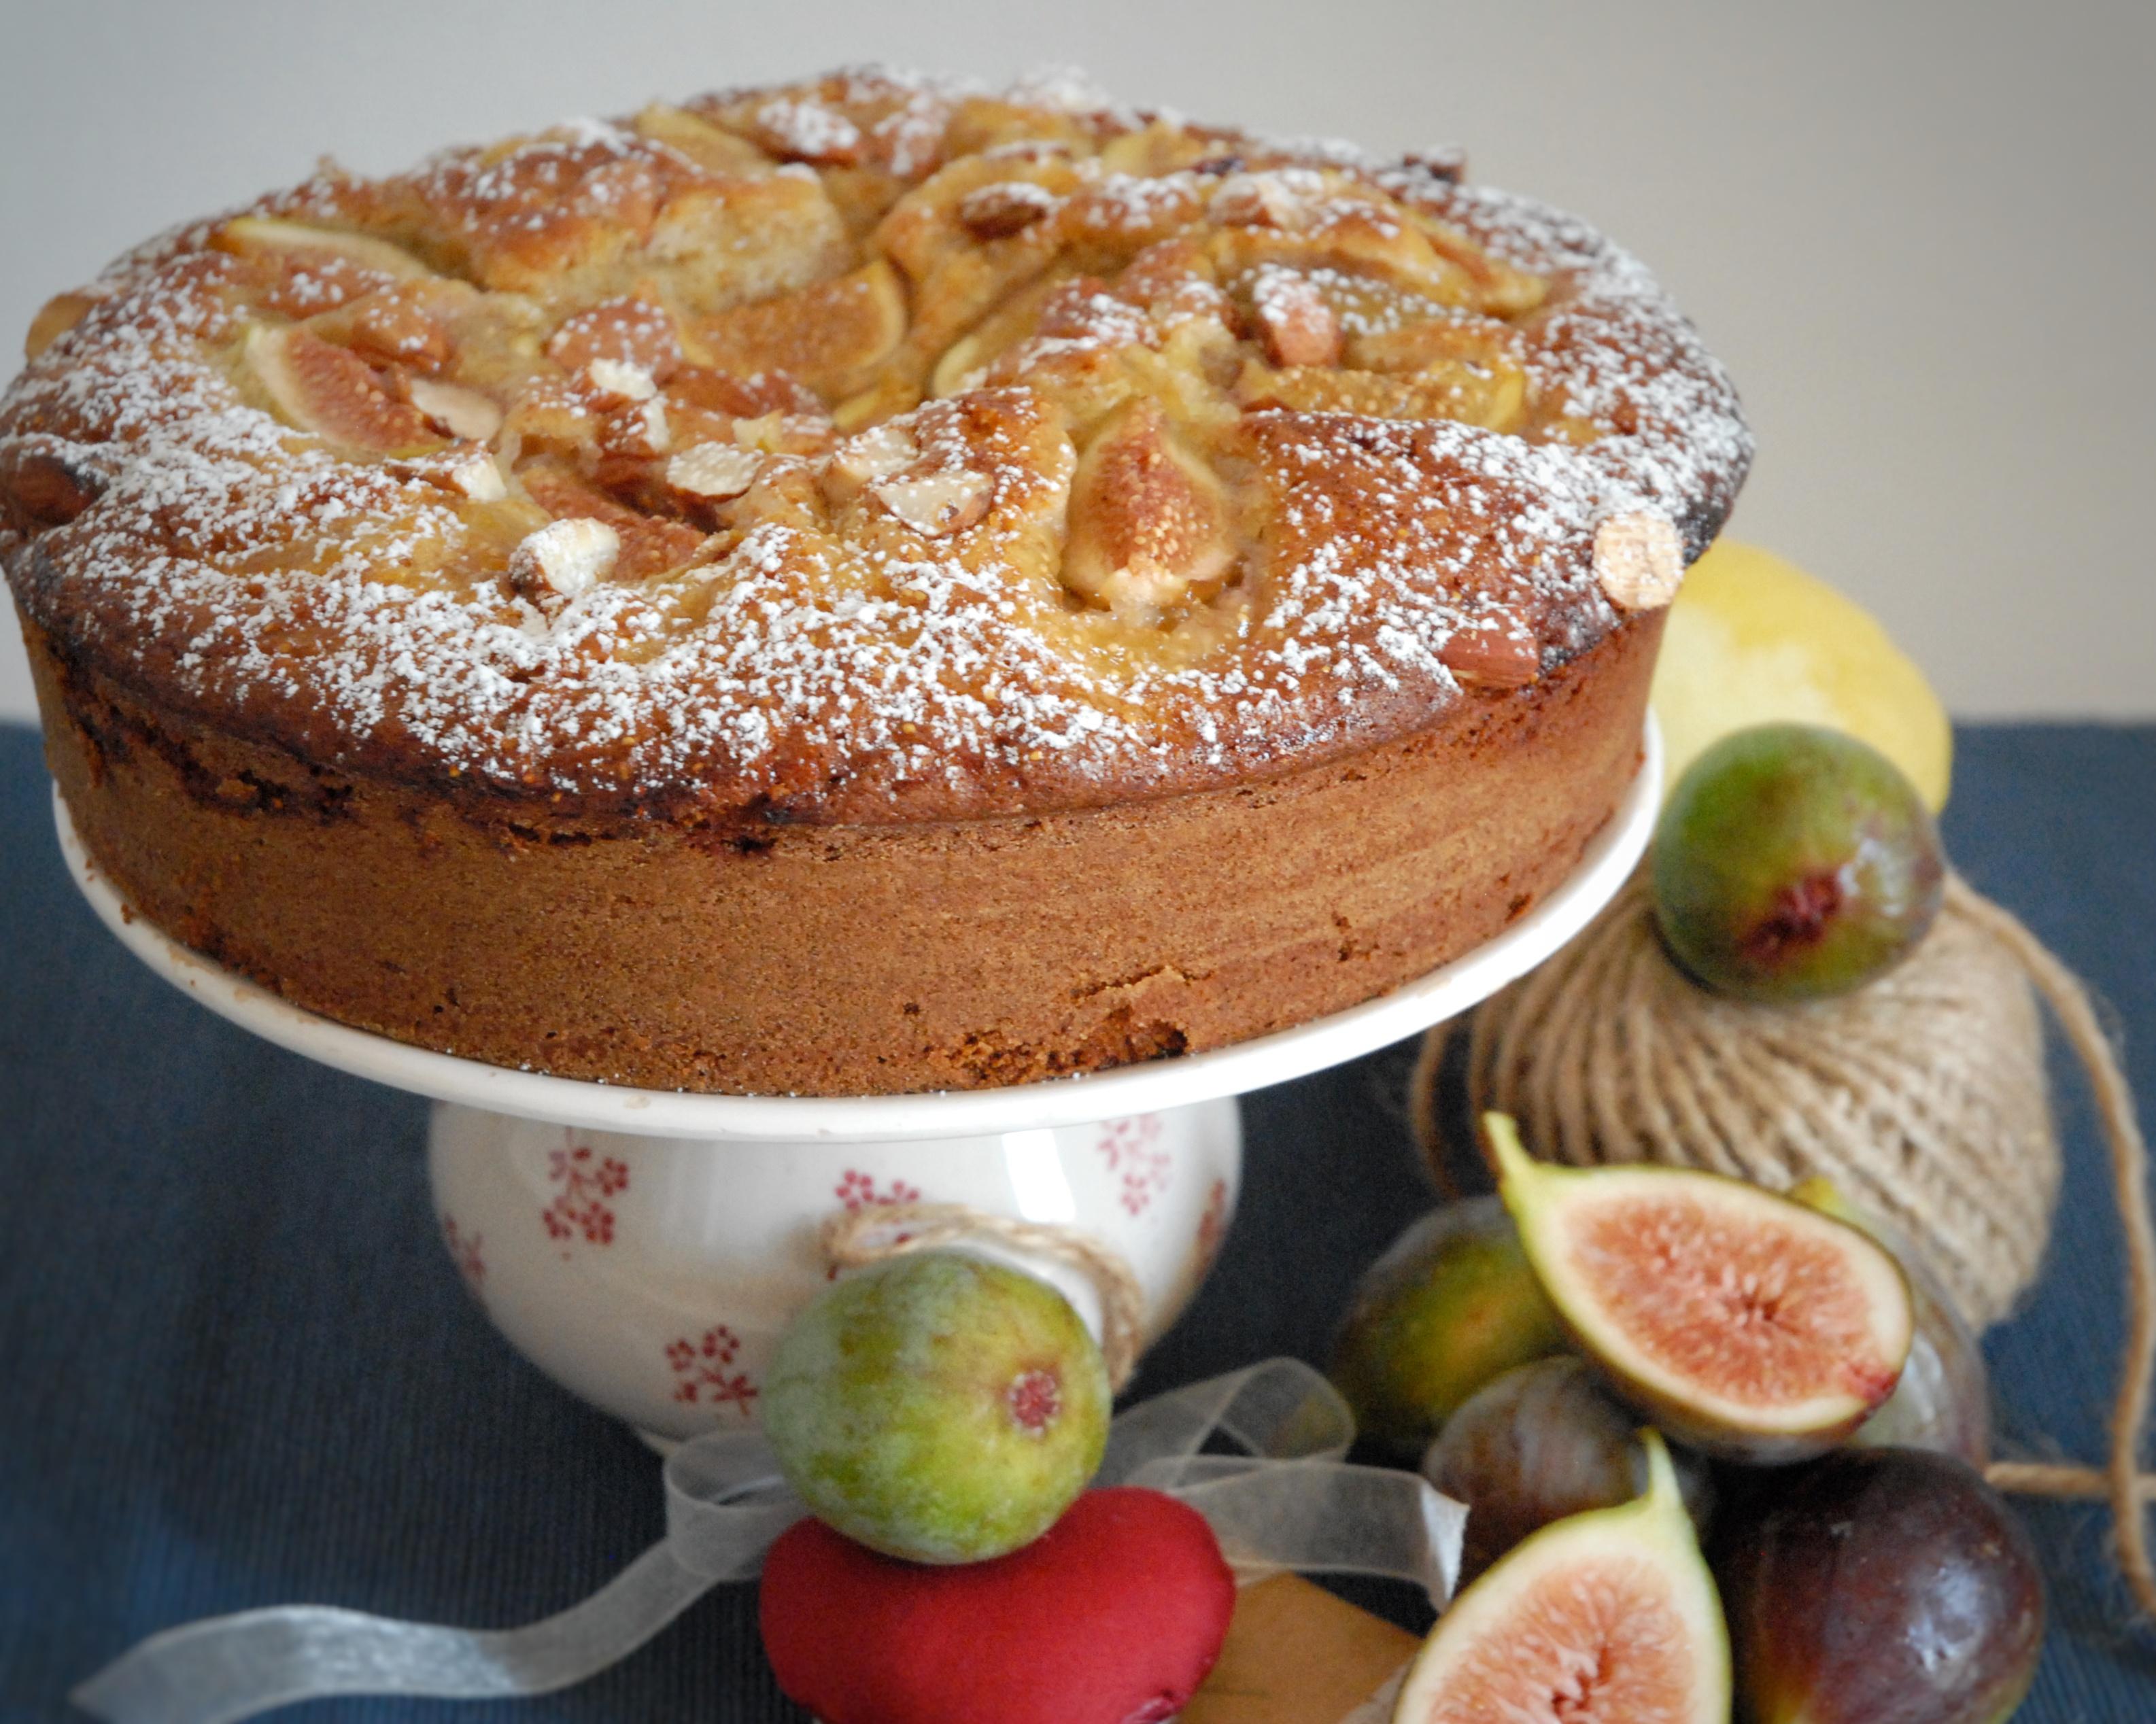 Torta semi integrale ai fichi, miele e mandorle